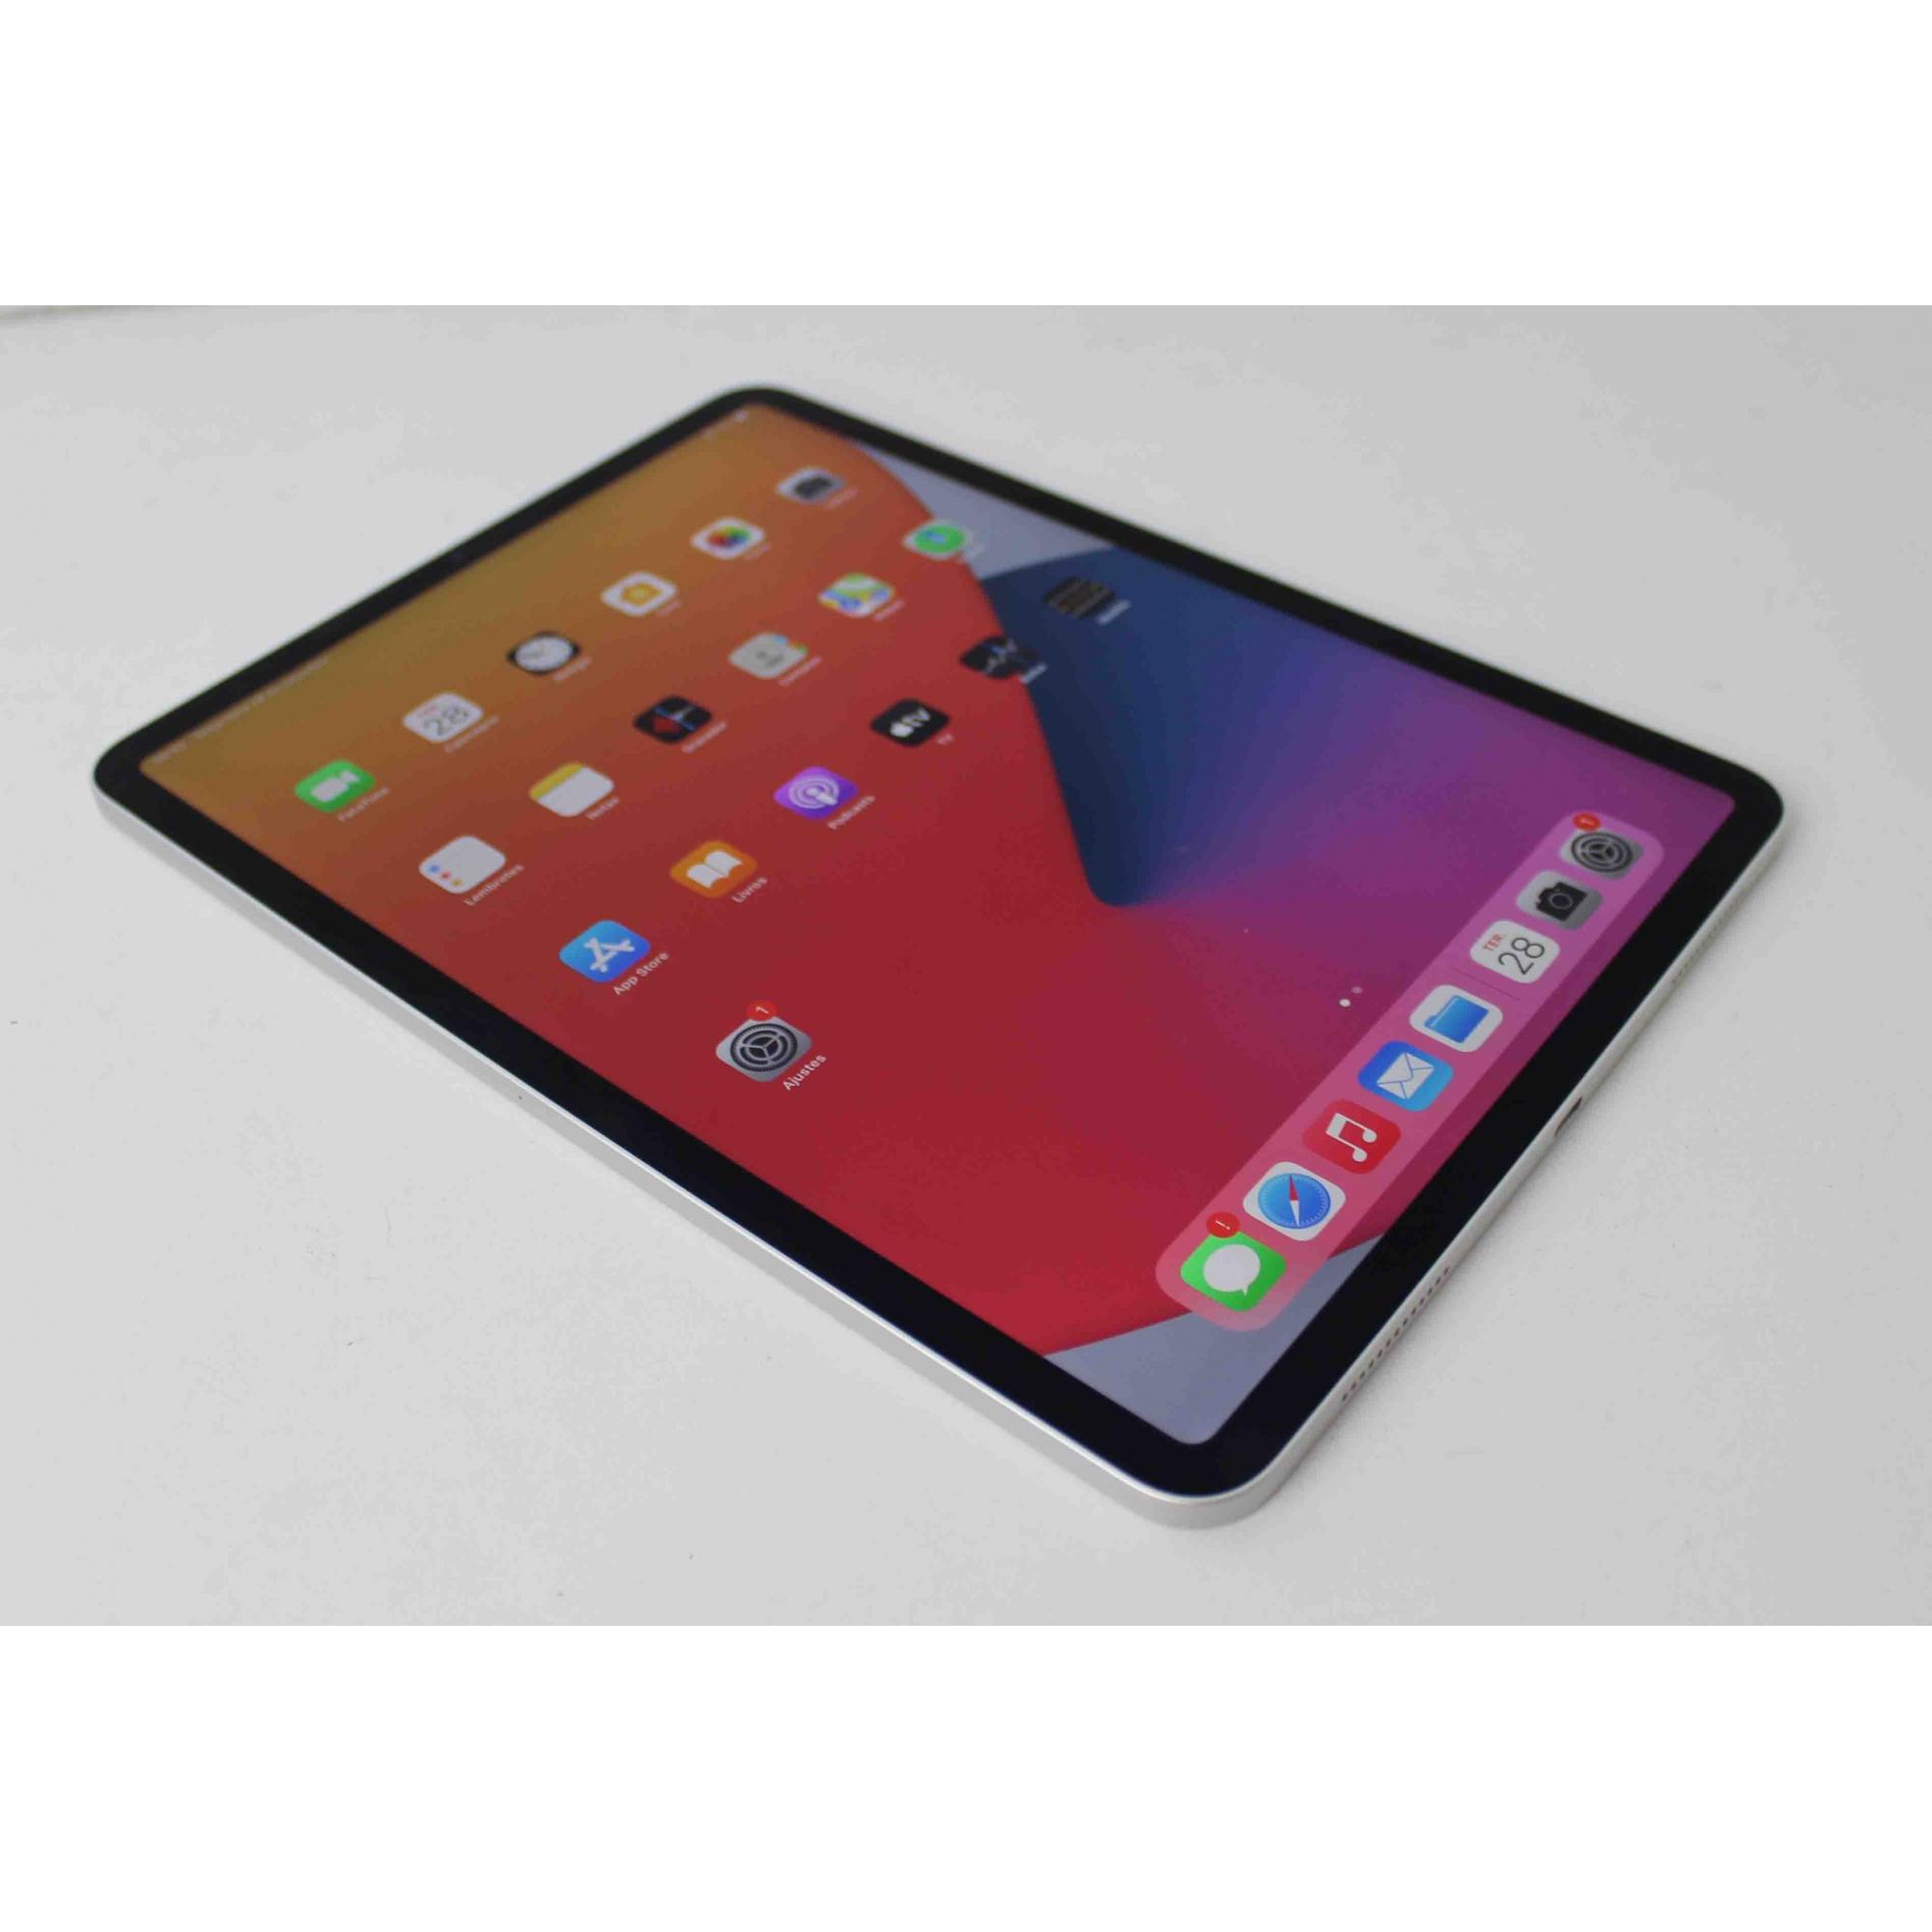 "iPad Pro MTXP2BZ/A  11"" 64GB Wifi - Silver"